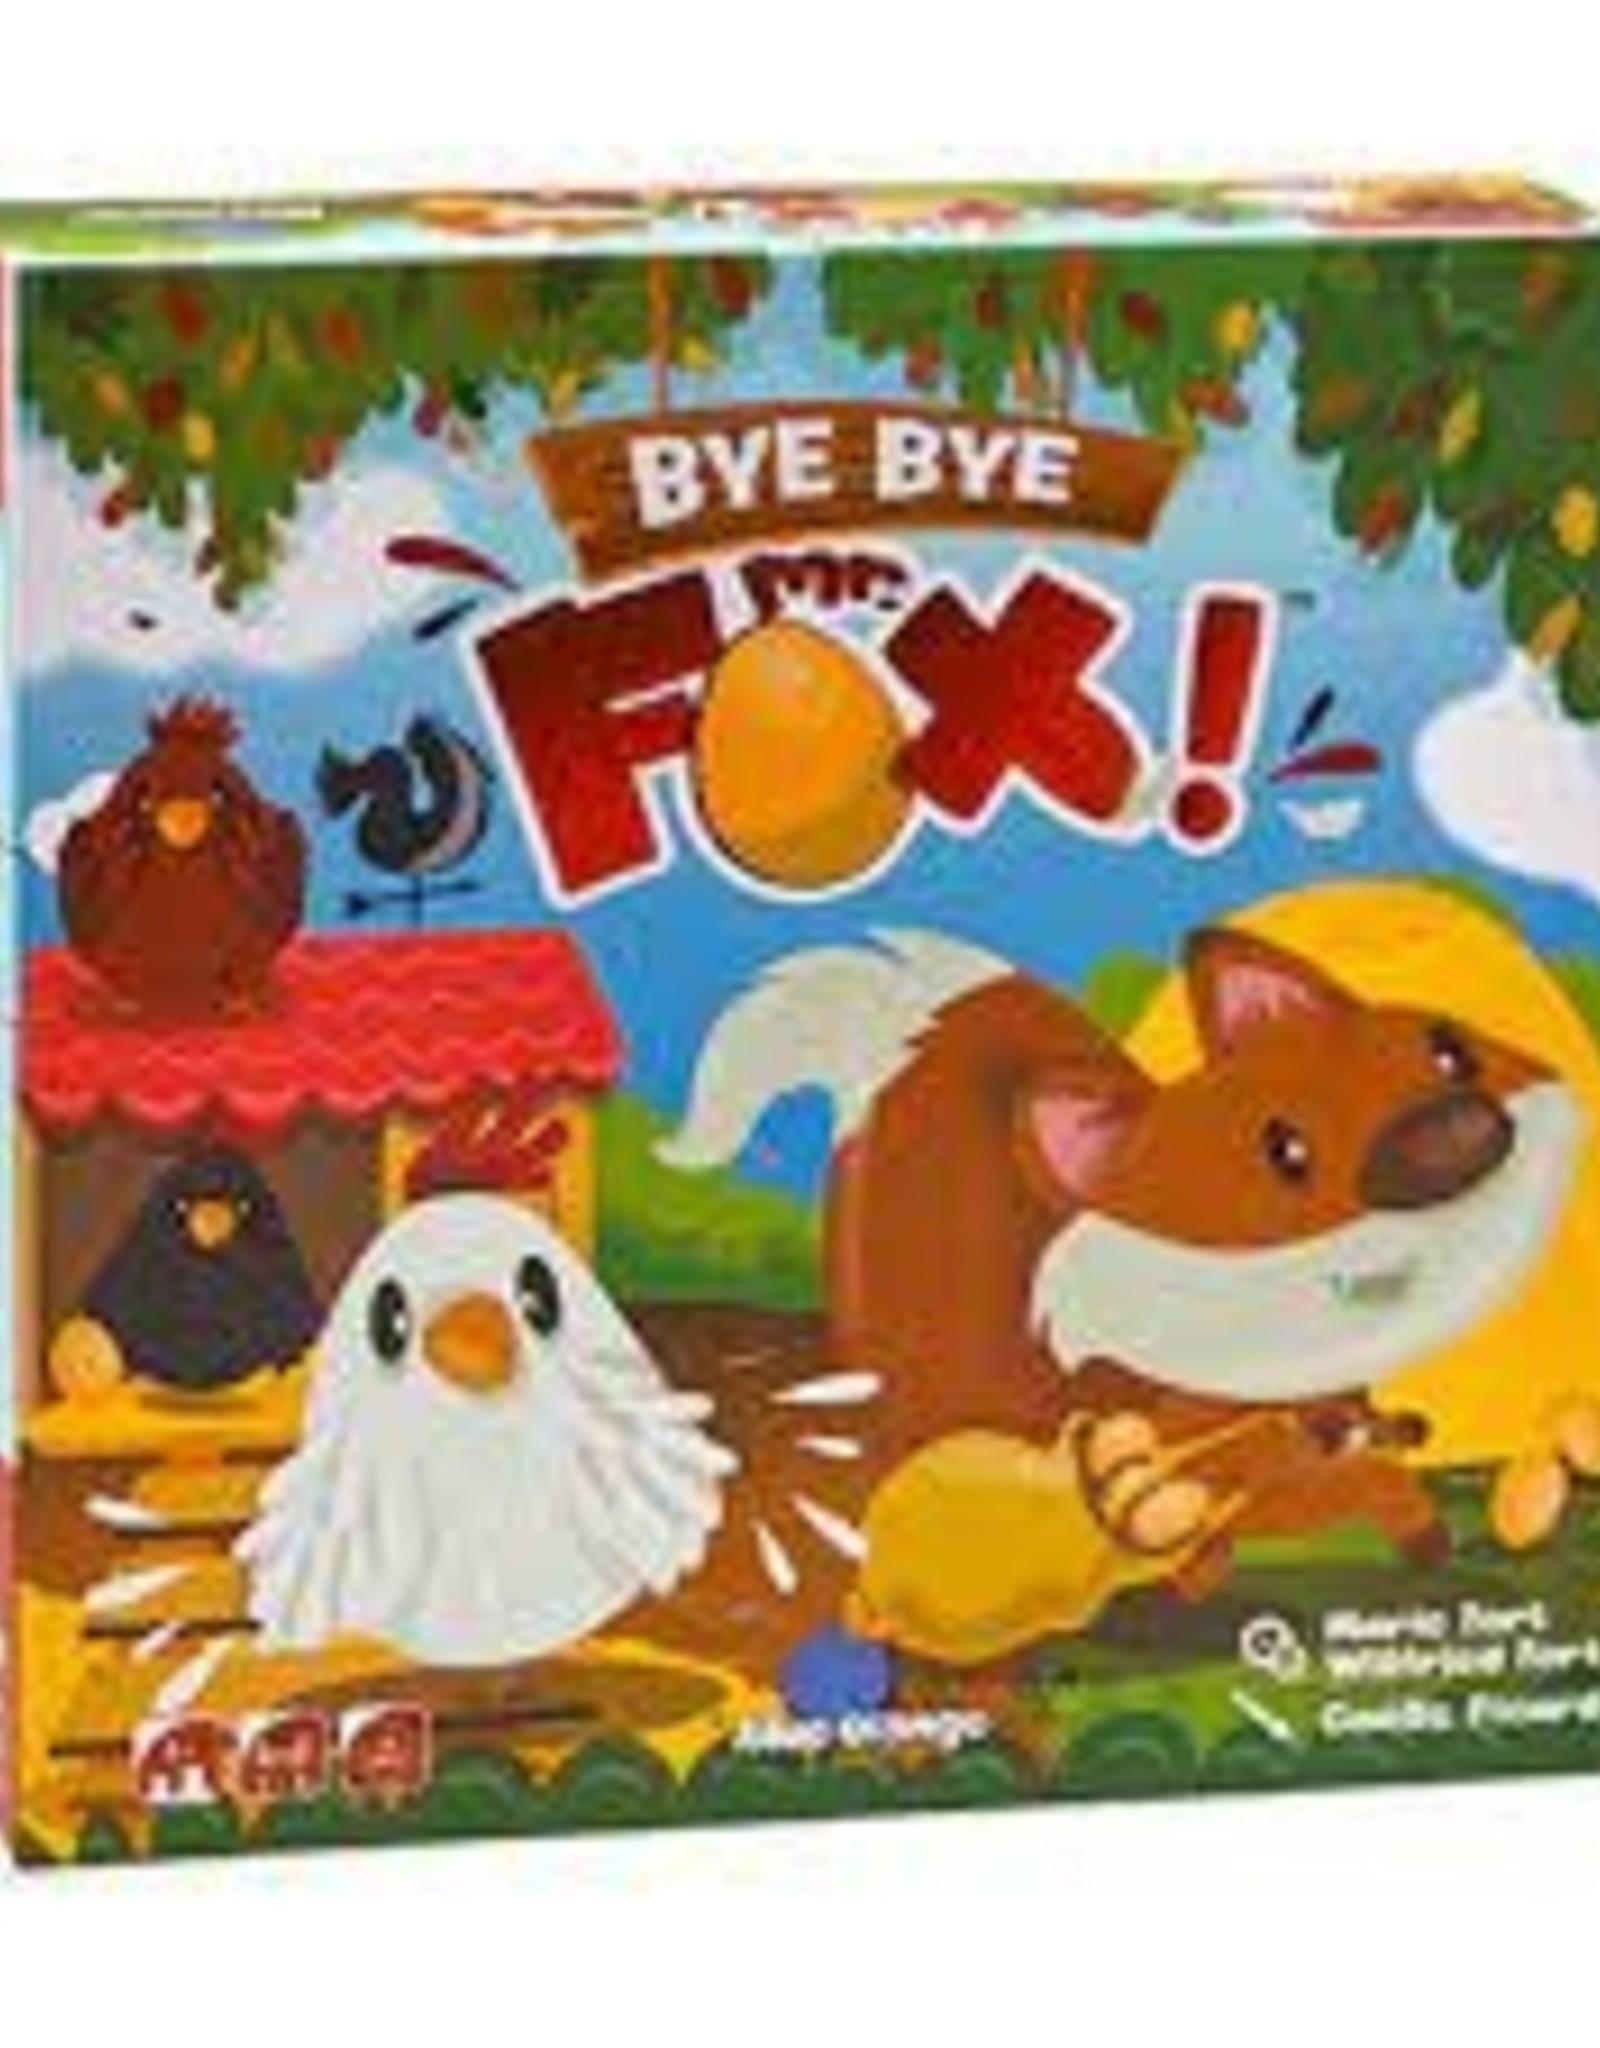 BLUE ORANGE BYE BYE MR FOX